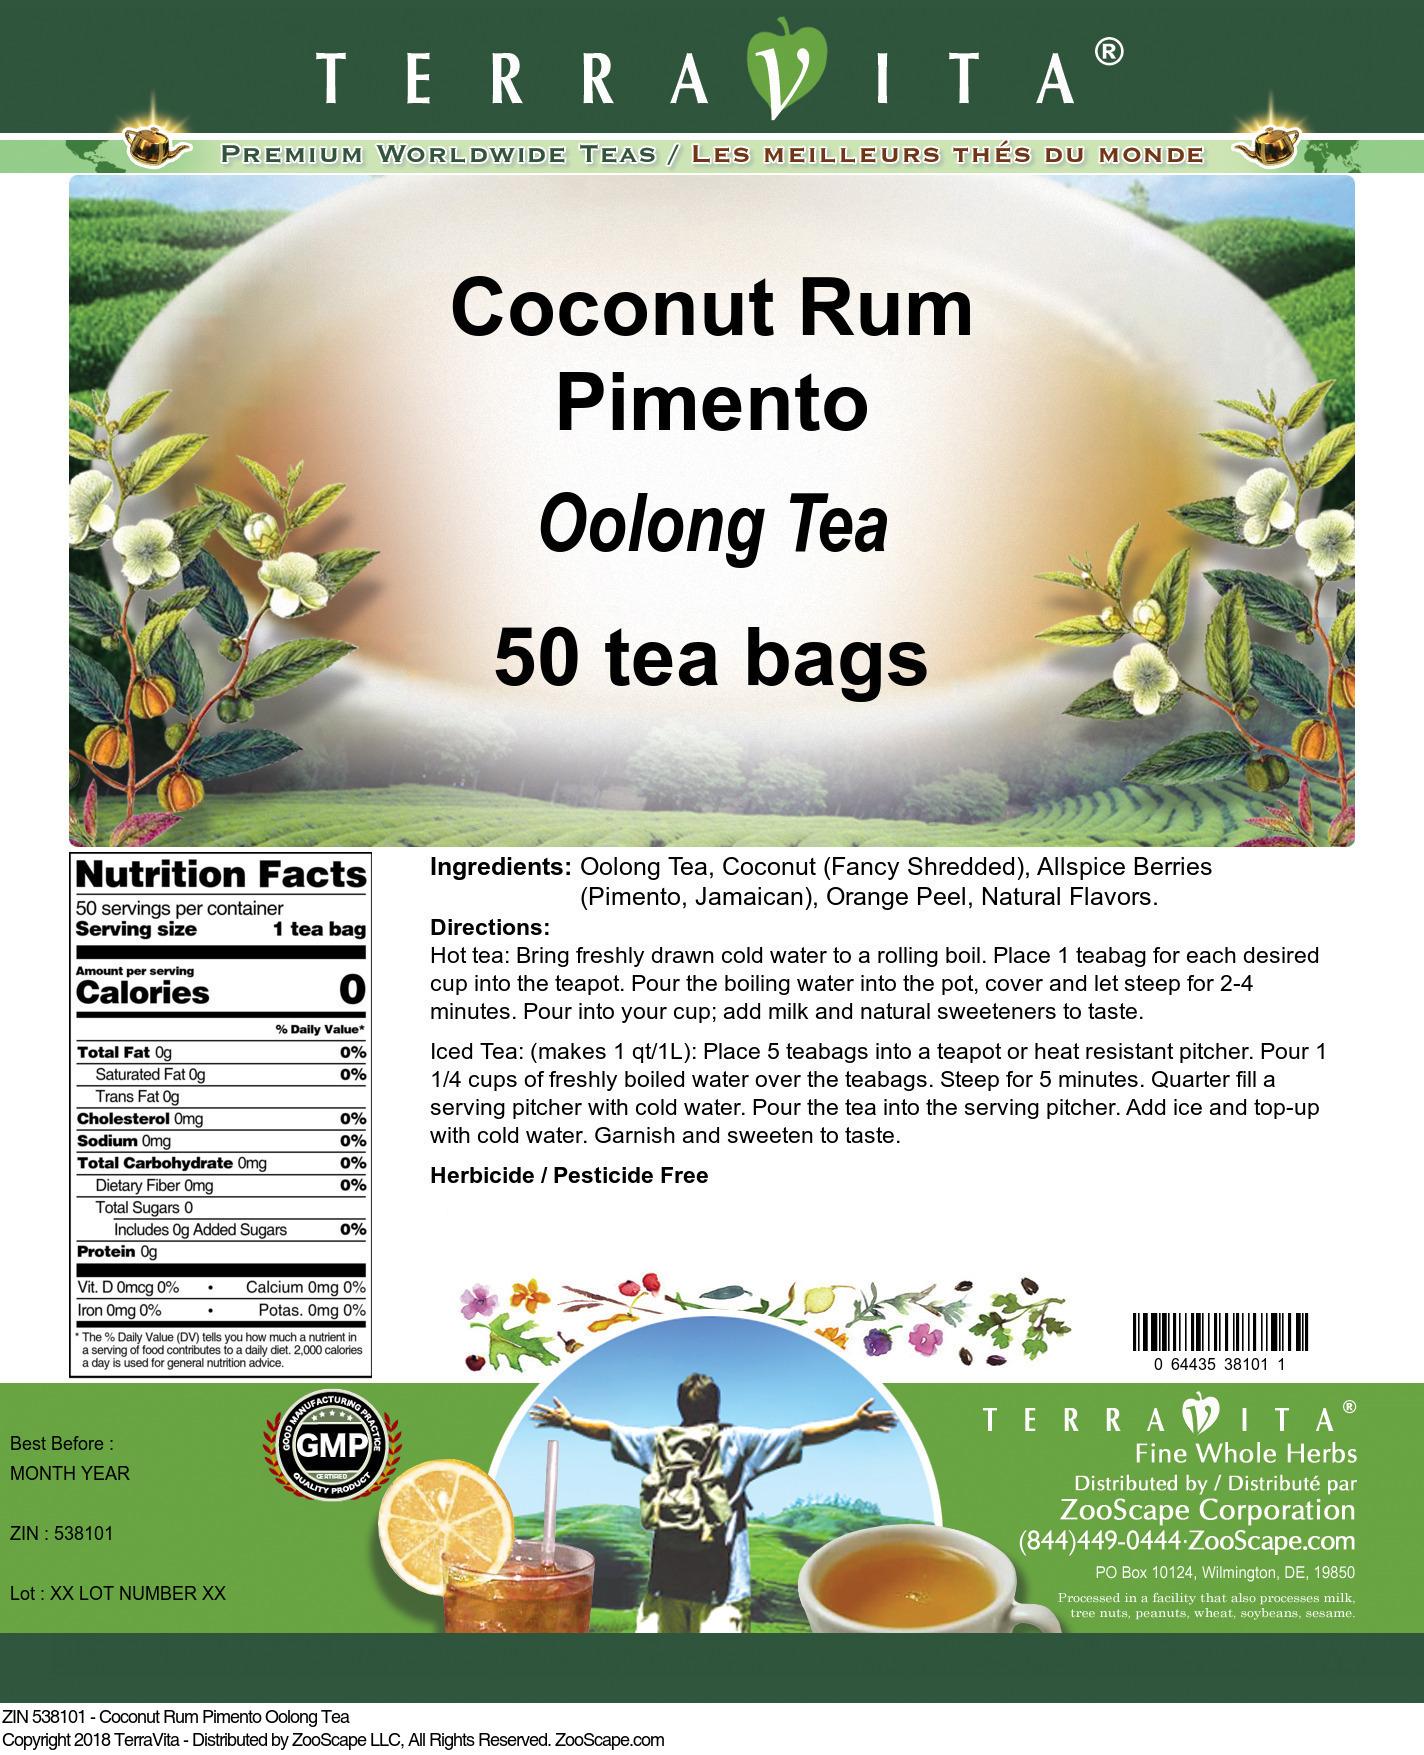 Coconut Rum Pimento Oolong Tea